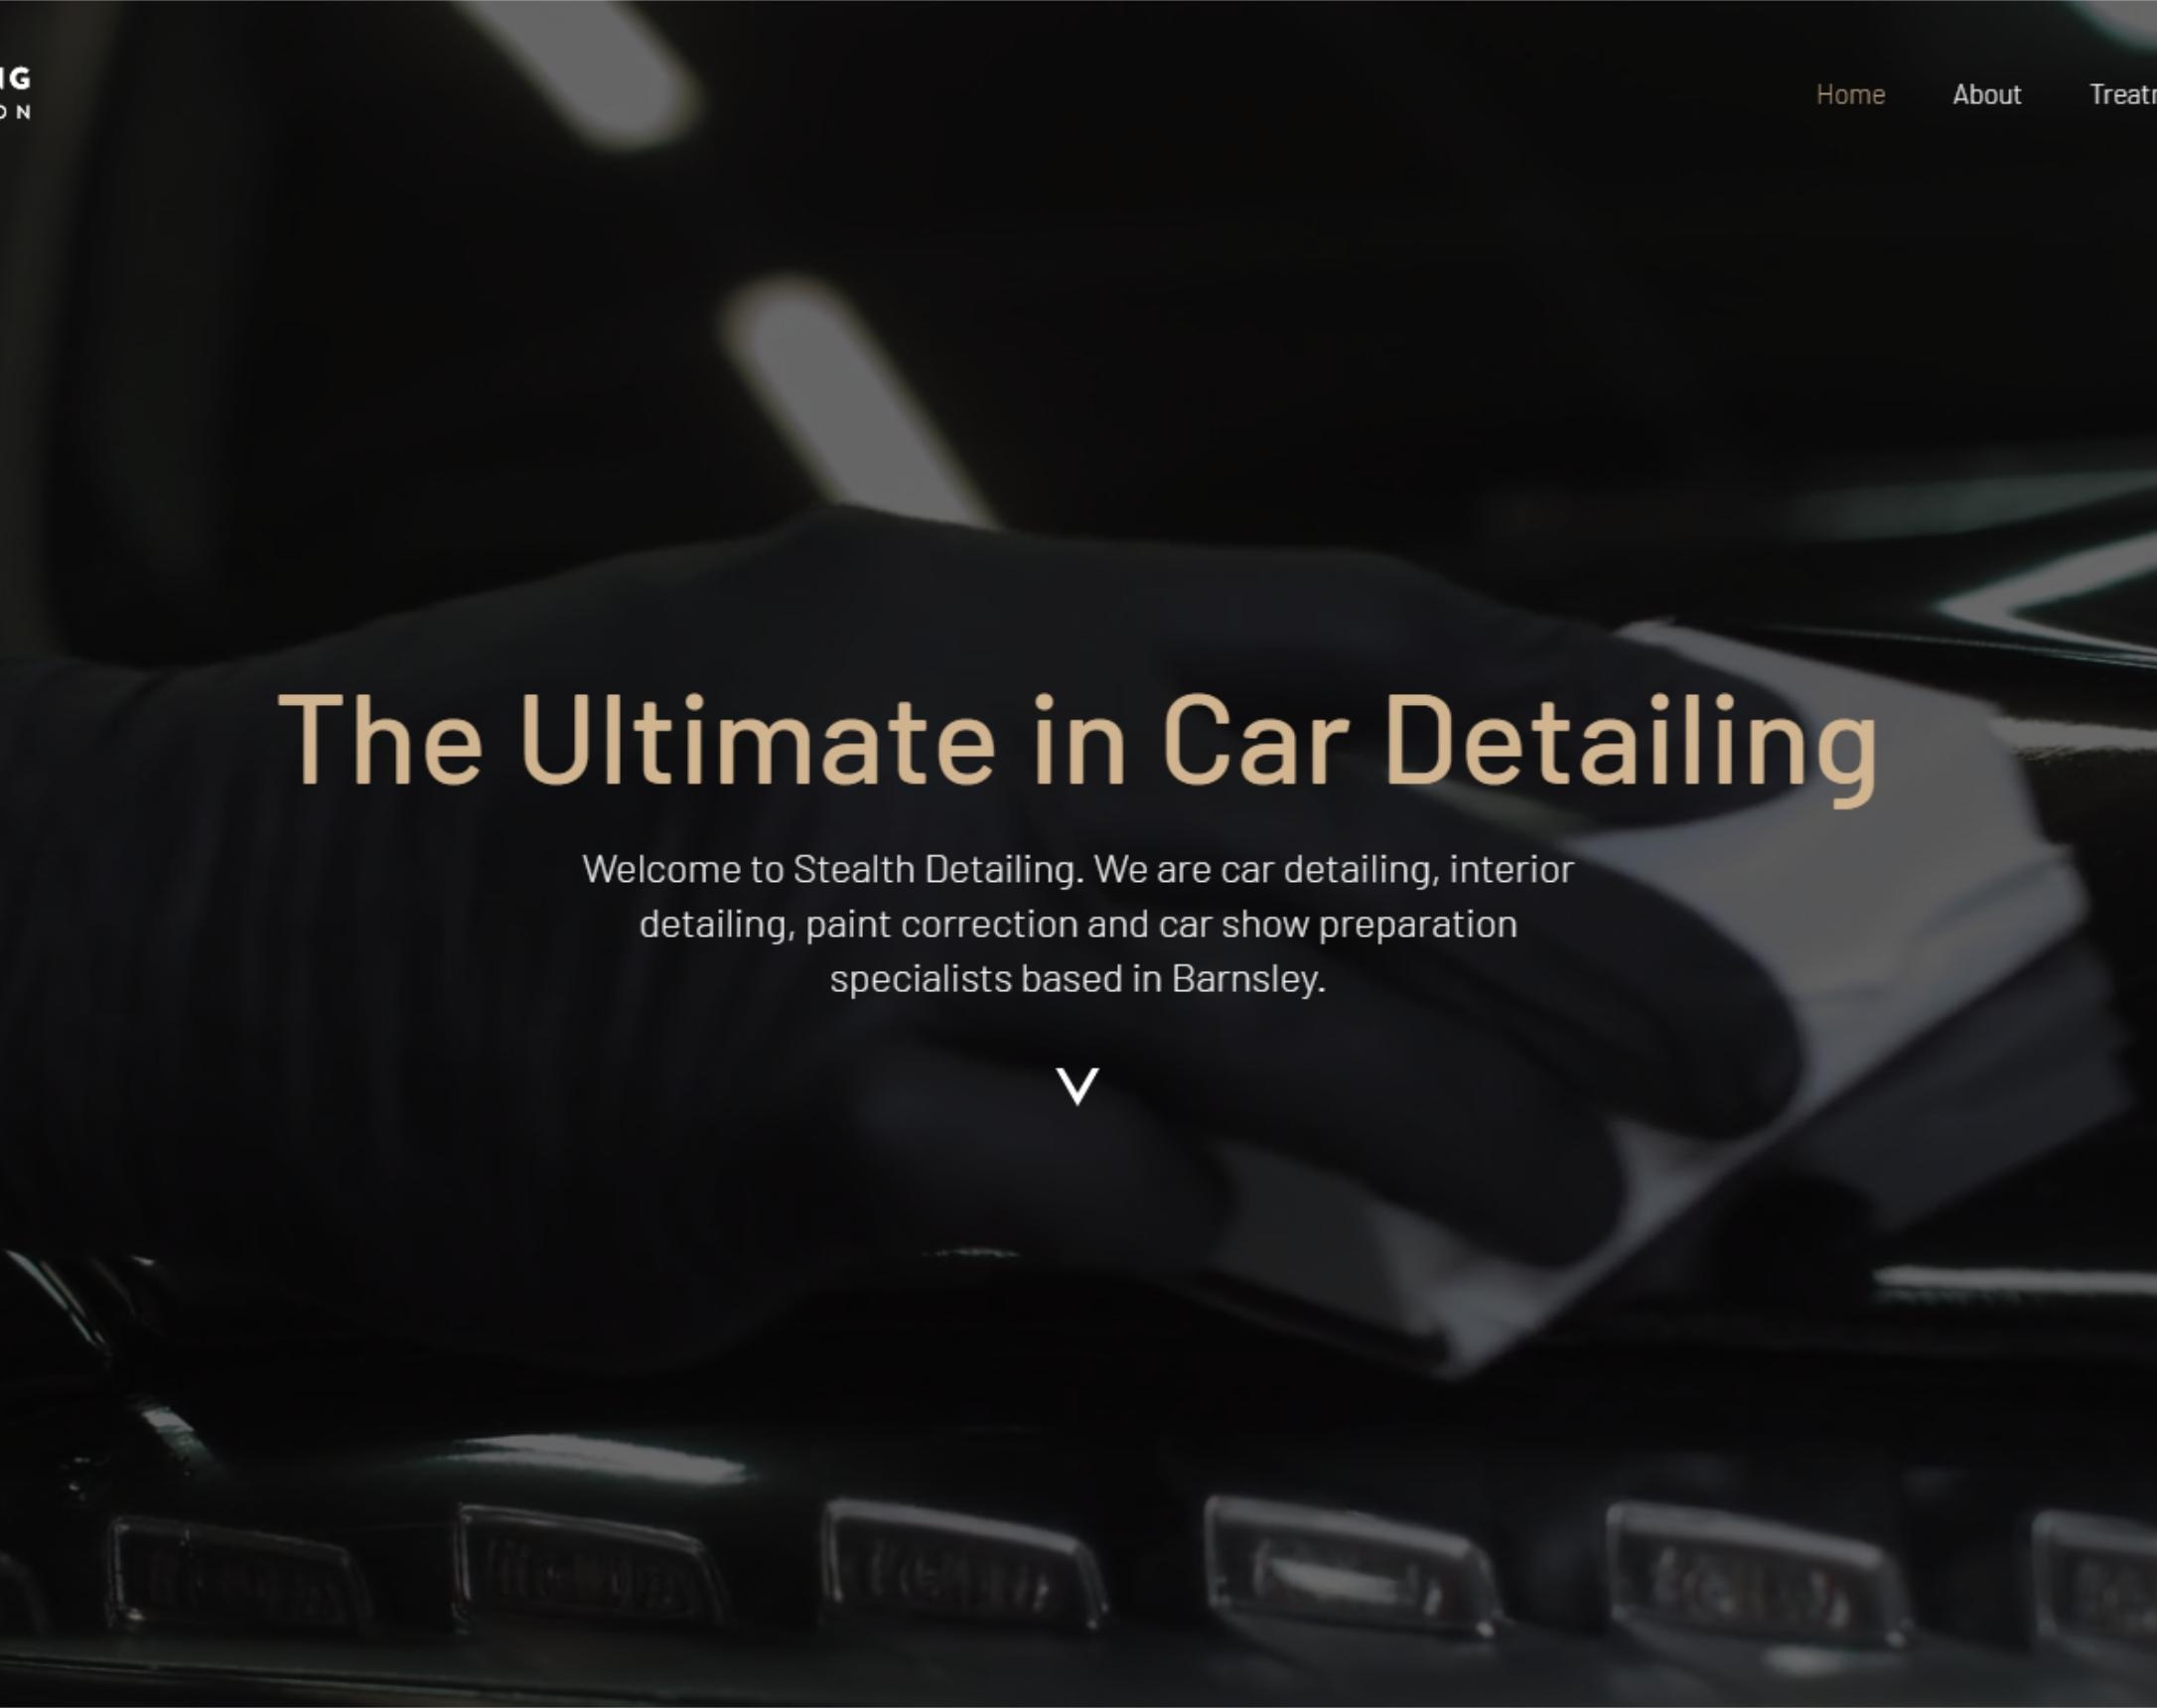 Stealth Detailing Car detailing, interior detailing, paint correctio...